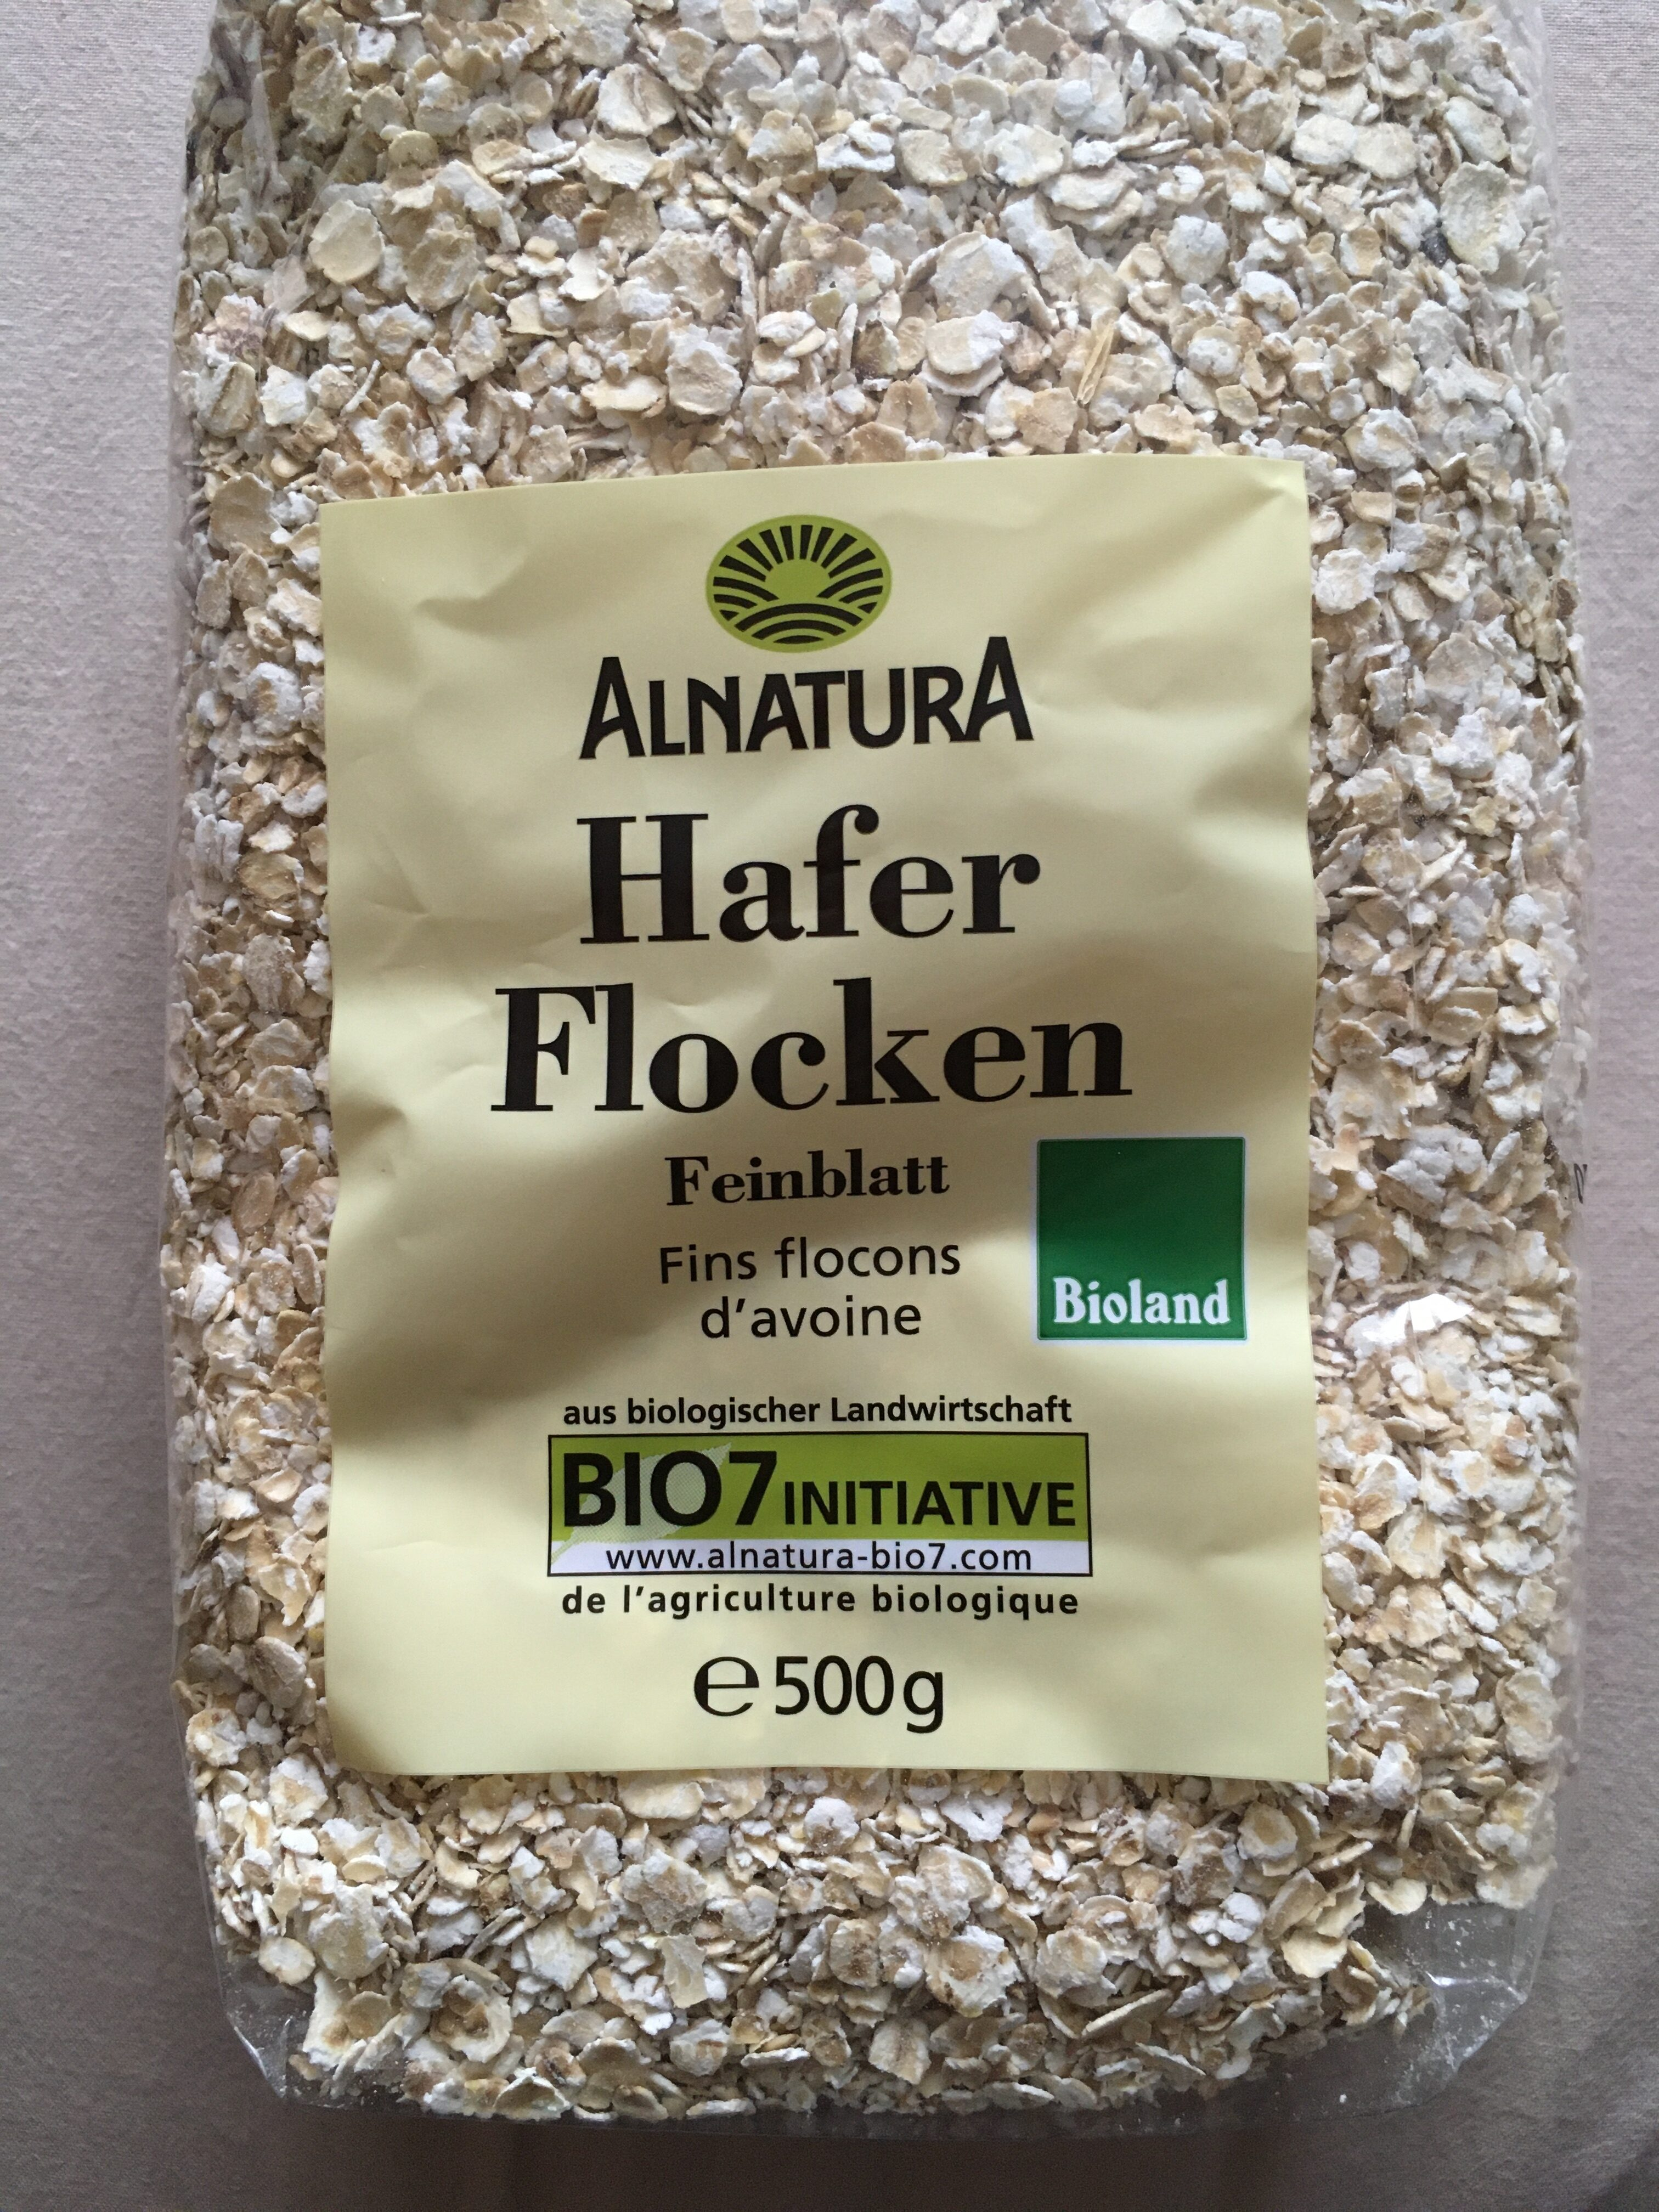 Haferflocken - Feinblatt - Product - de